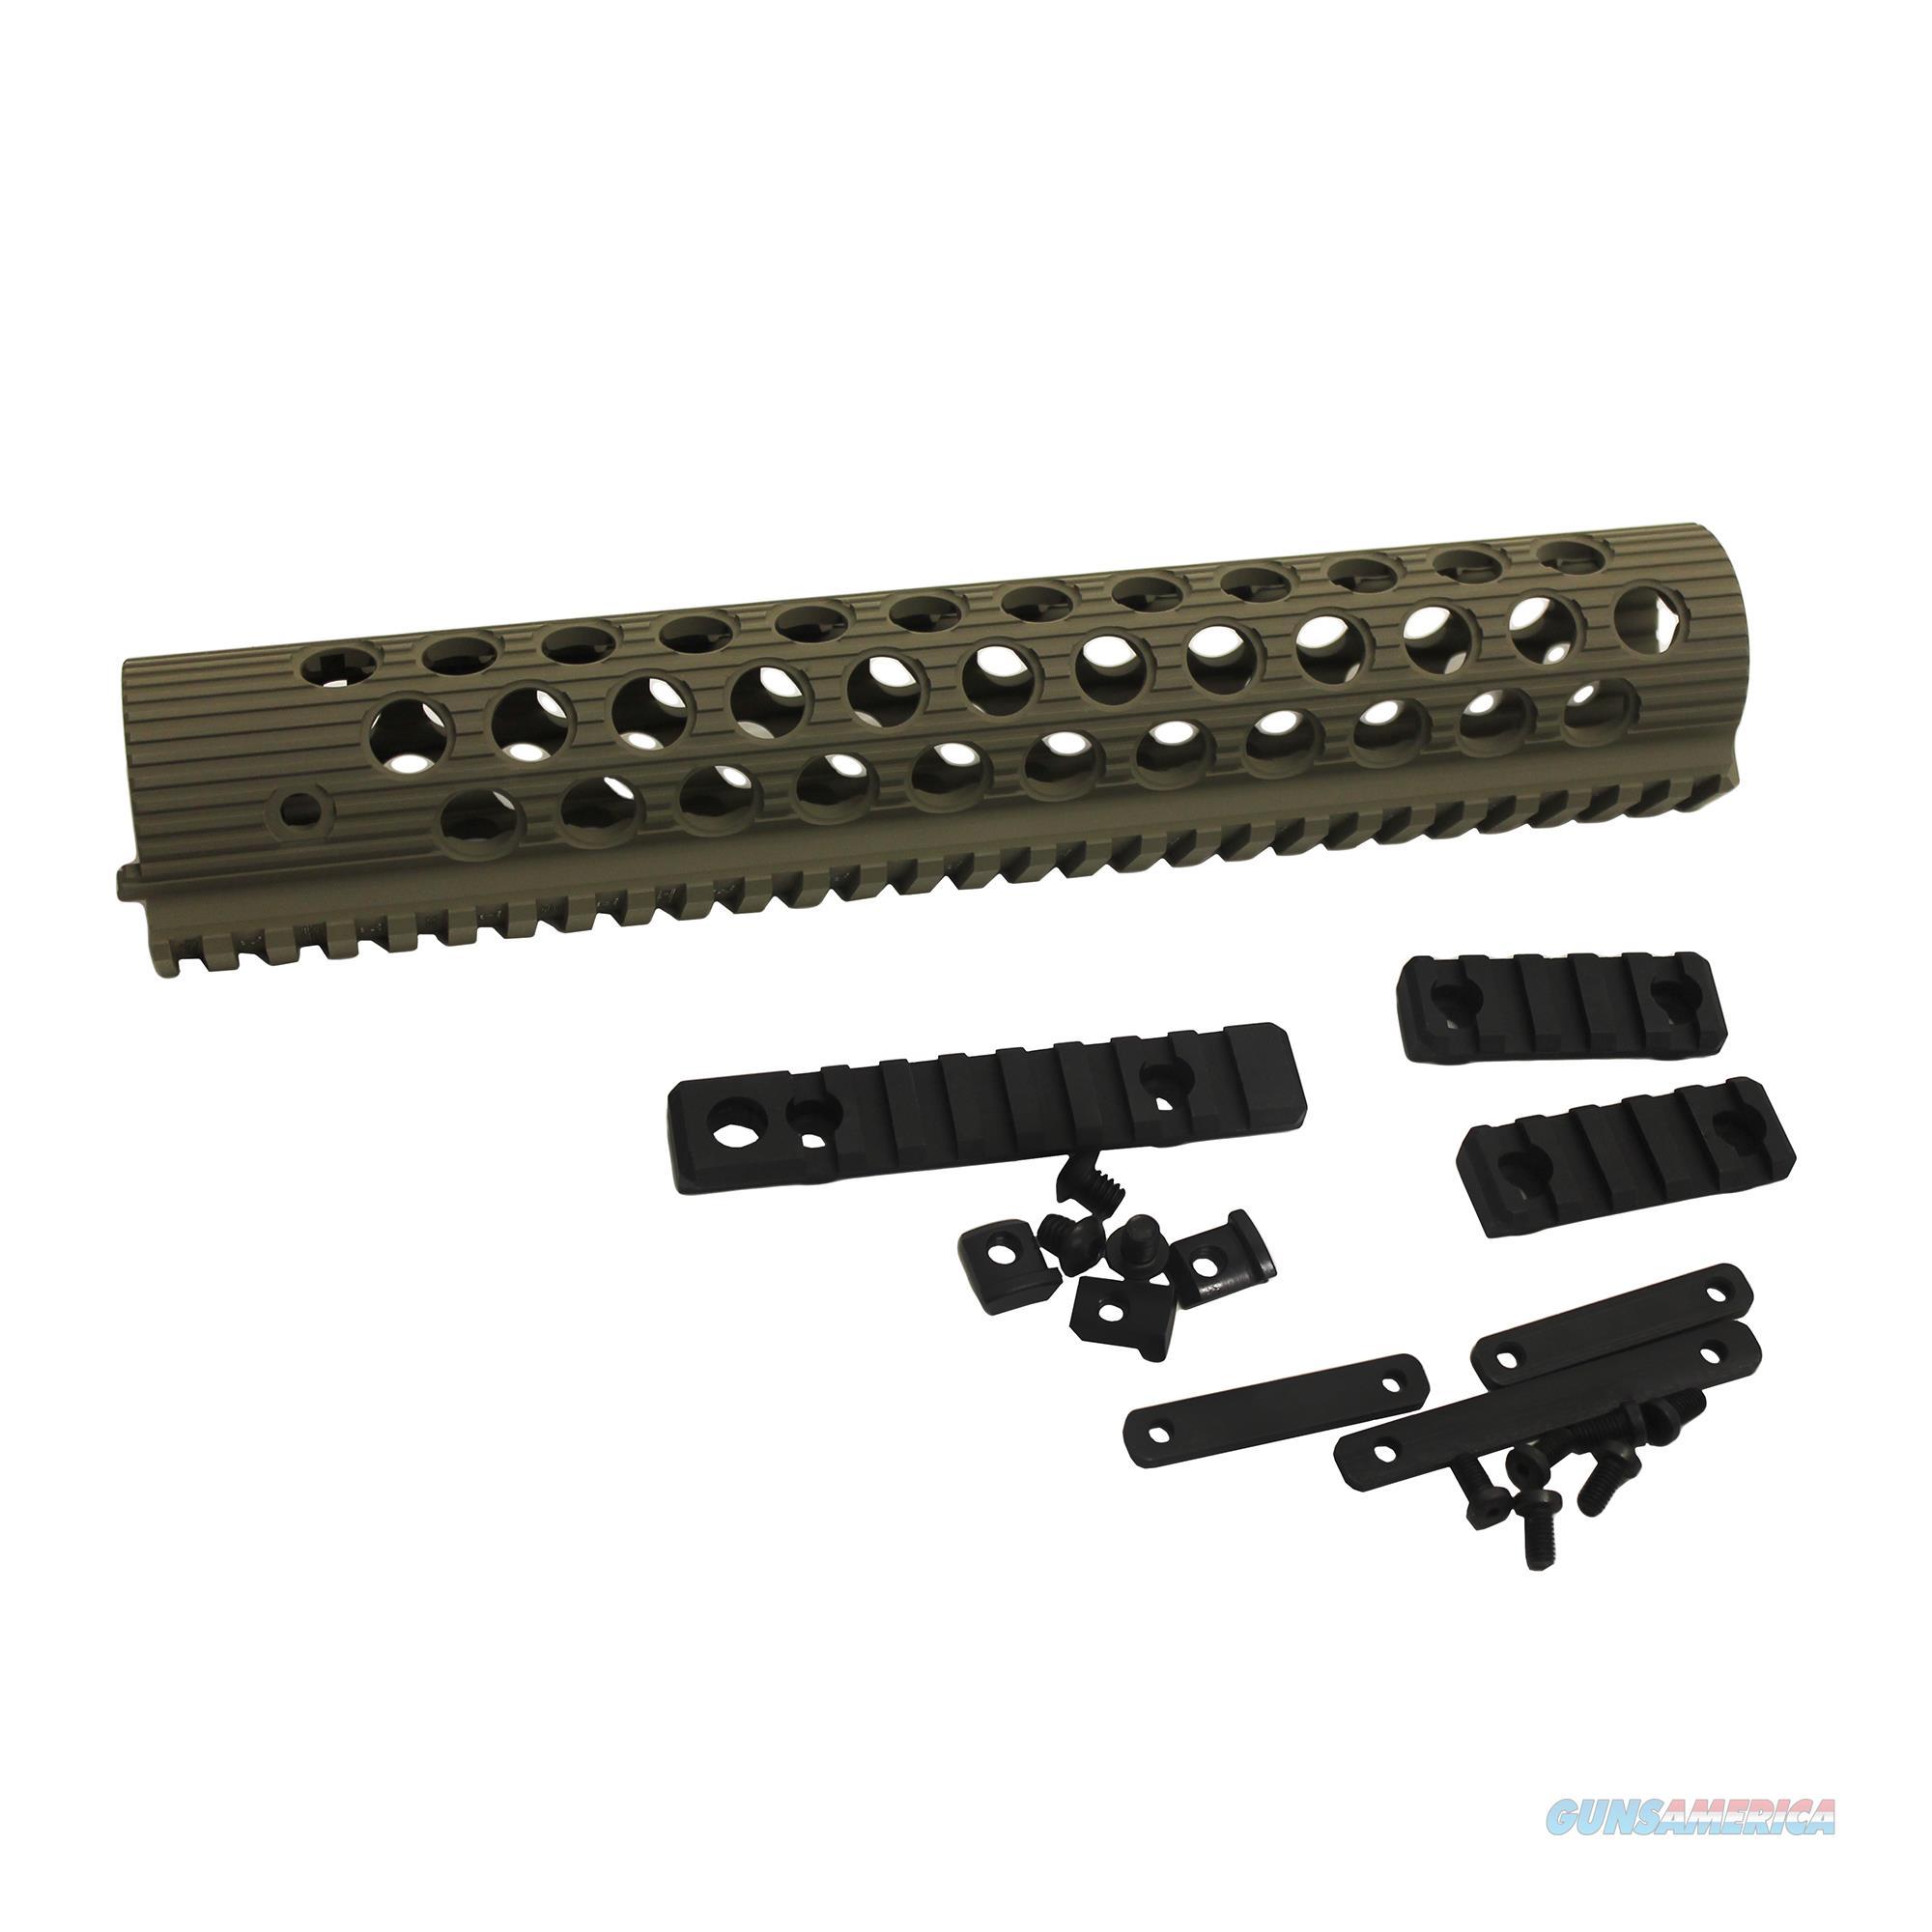 Troy Industries Inc Alpha Rail Flat Dark Earth STRX-AL1-11FT-01  Non-Guns > Gunstocks, Grips & Wood